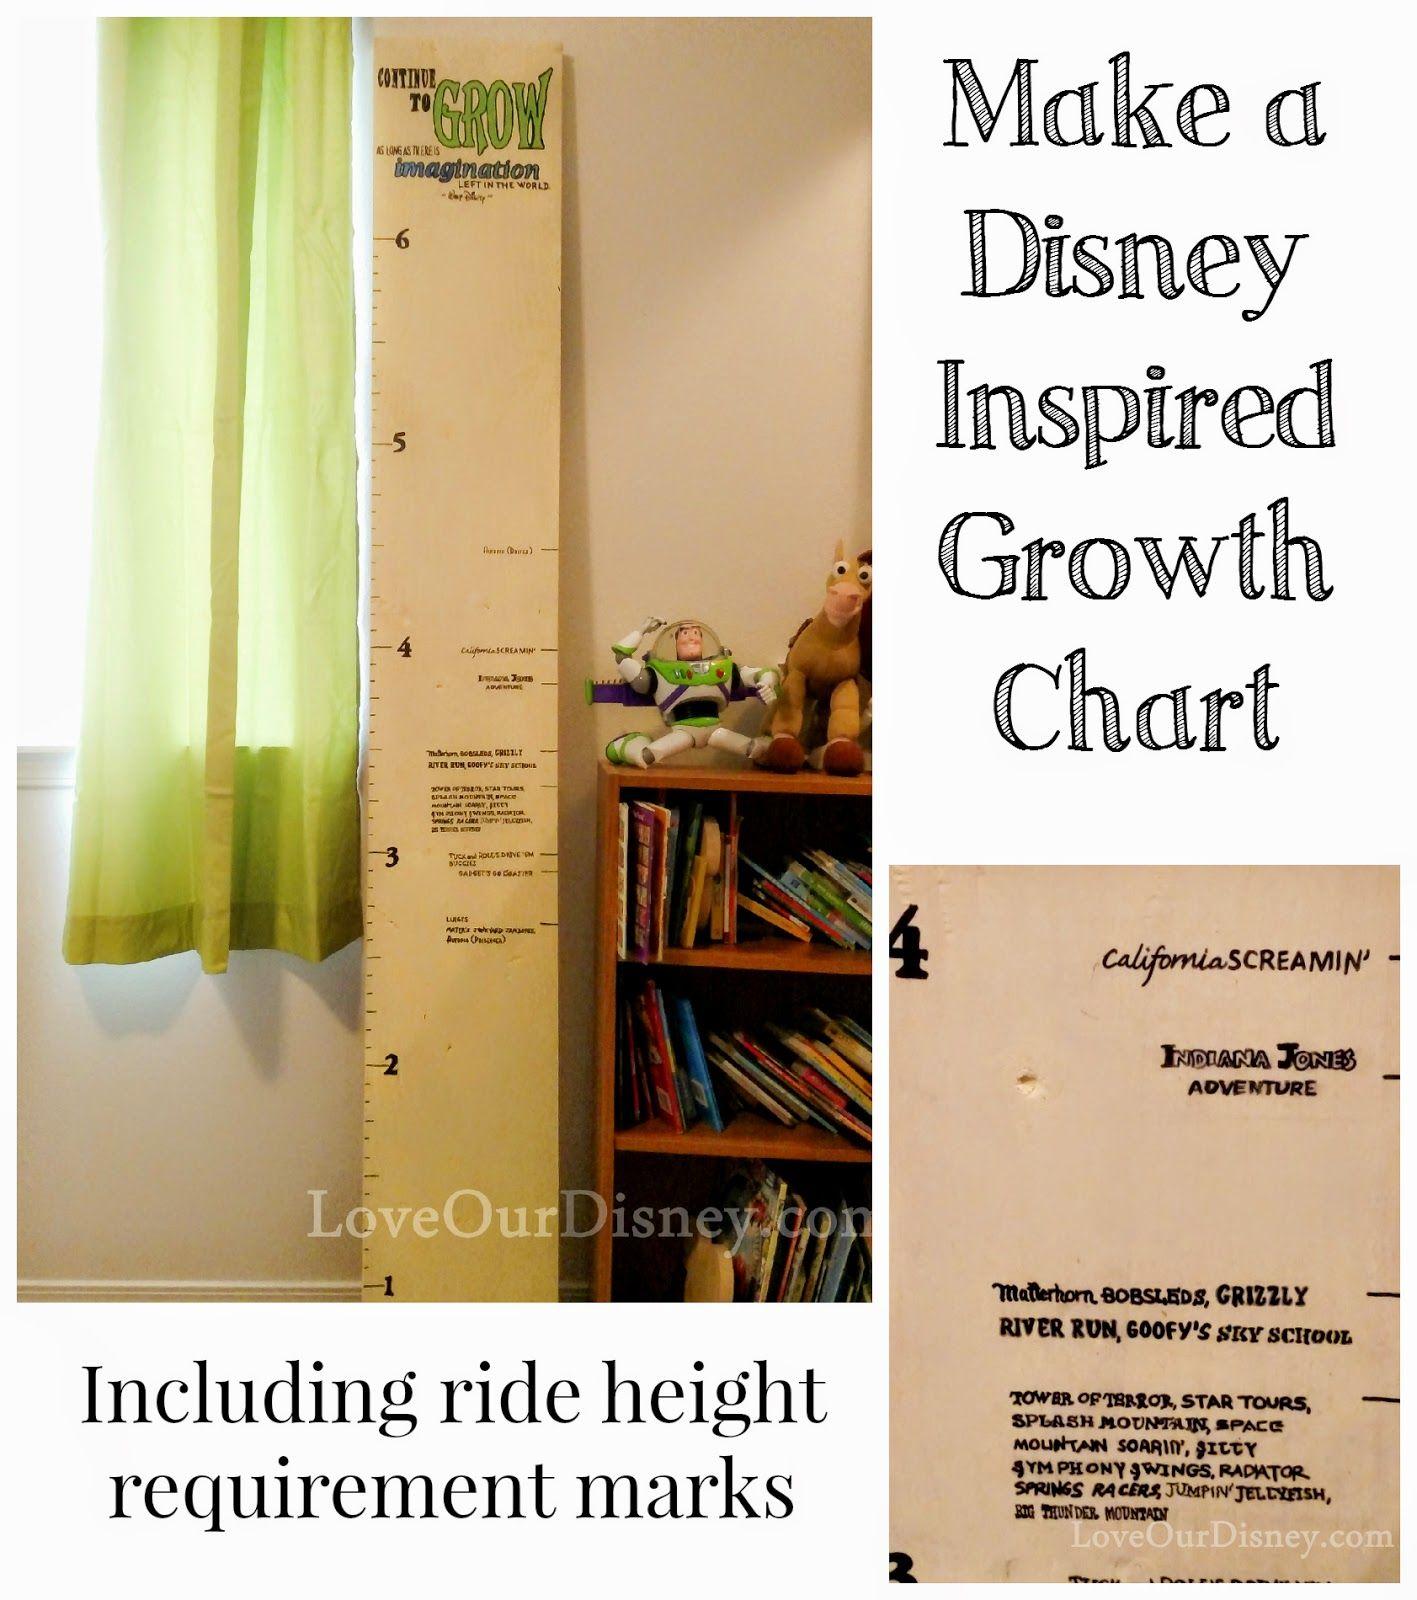 5daad417eac63c9aa812daf6c5aa08be - Cheetah Hunt Busch Gardens Height Requirement